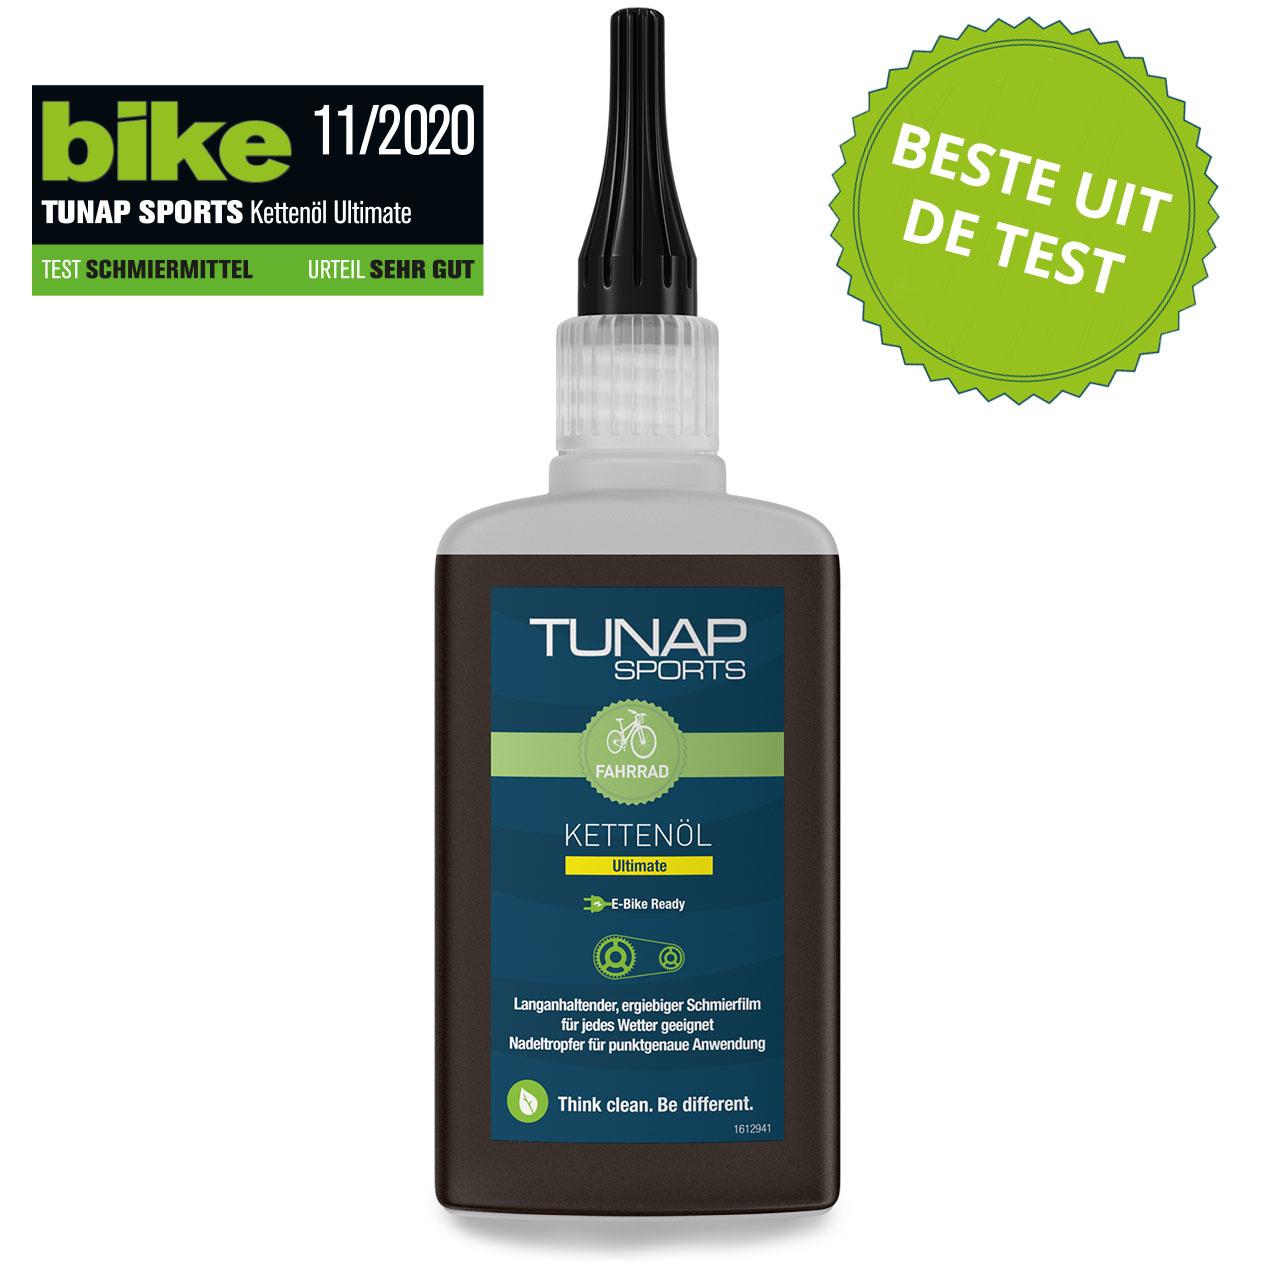 TUNAP Sports TUNAP Sports spray imperméabilisant  (300ml) - Copy